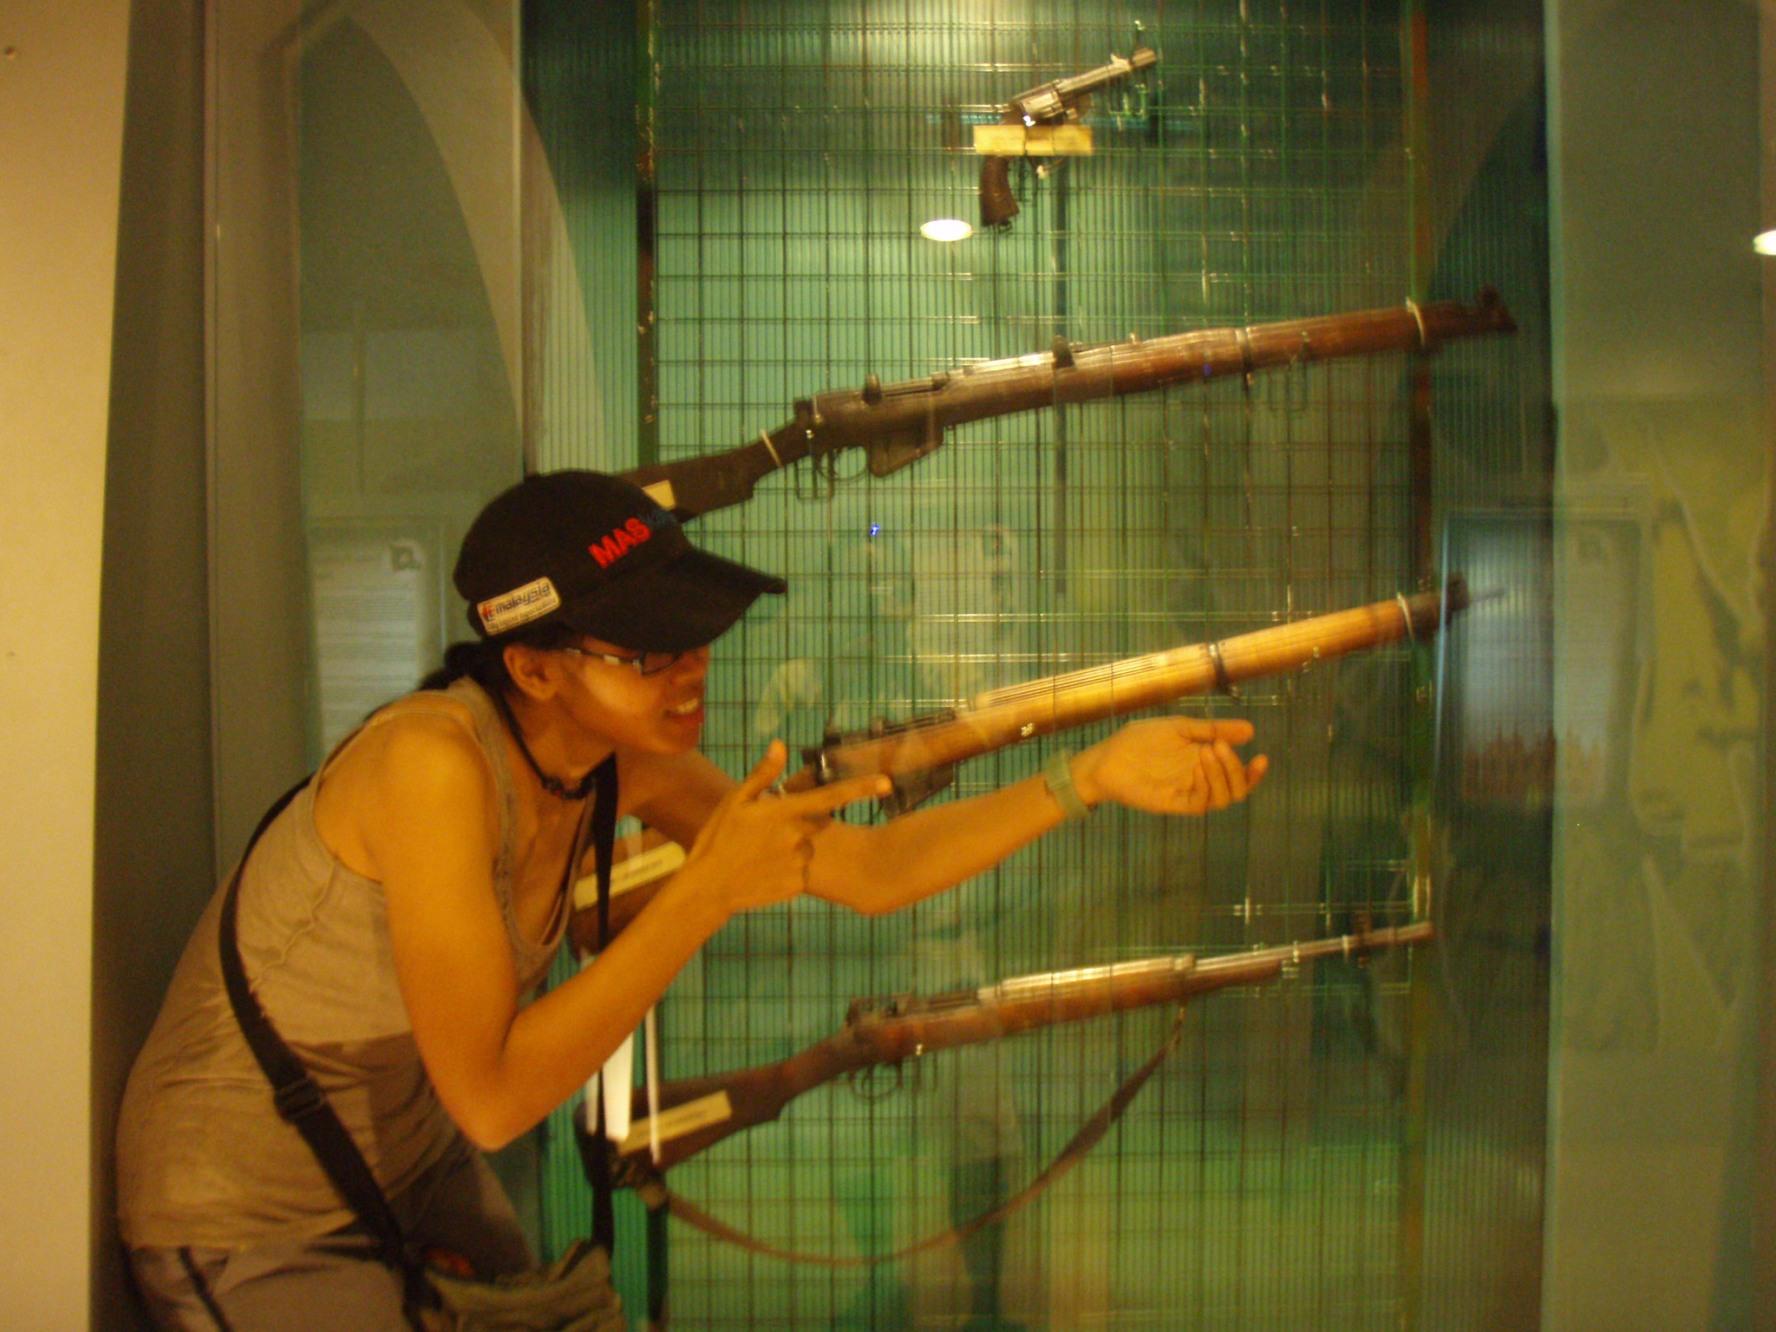 Musuh di hadapan..tembak bertubi-tubi!!!!